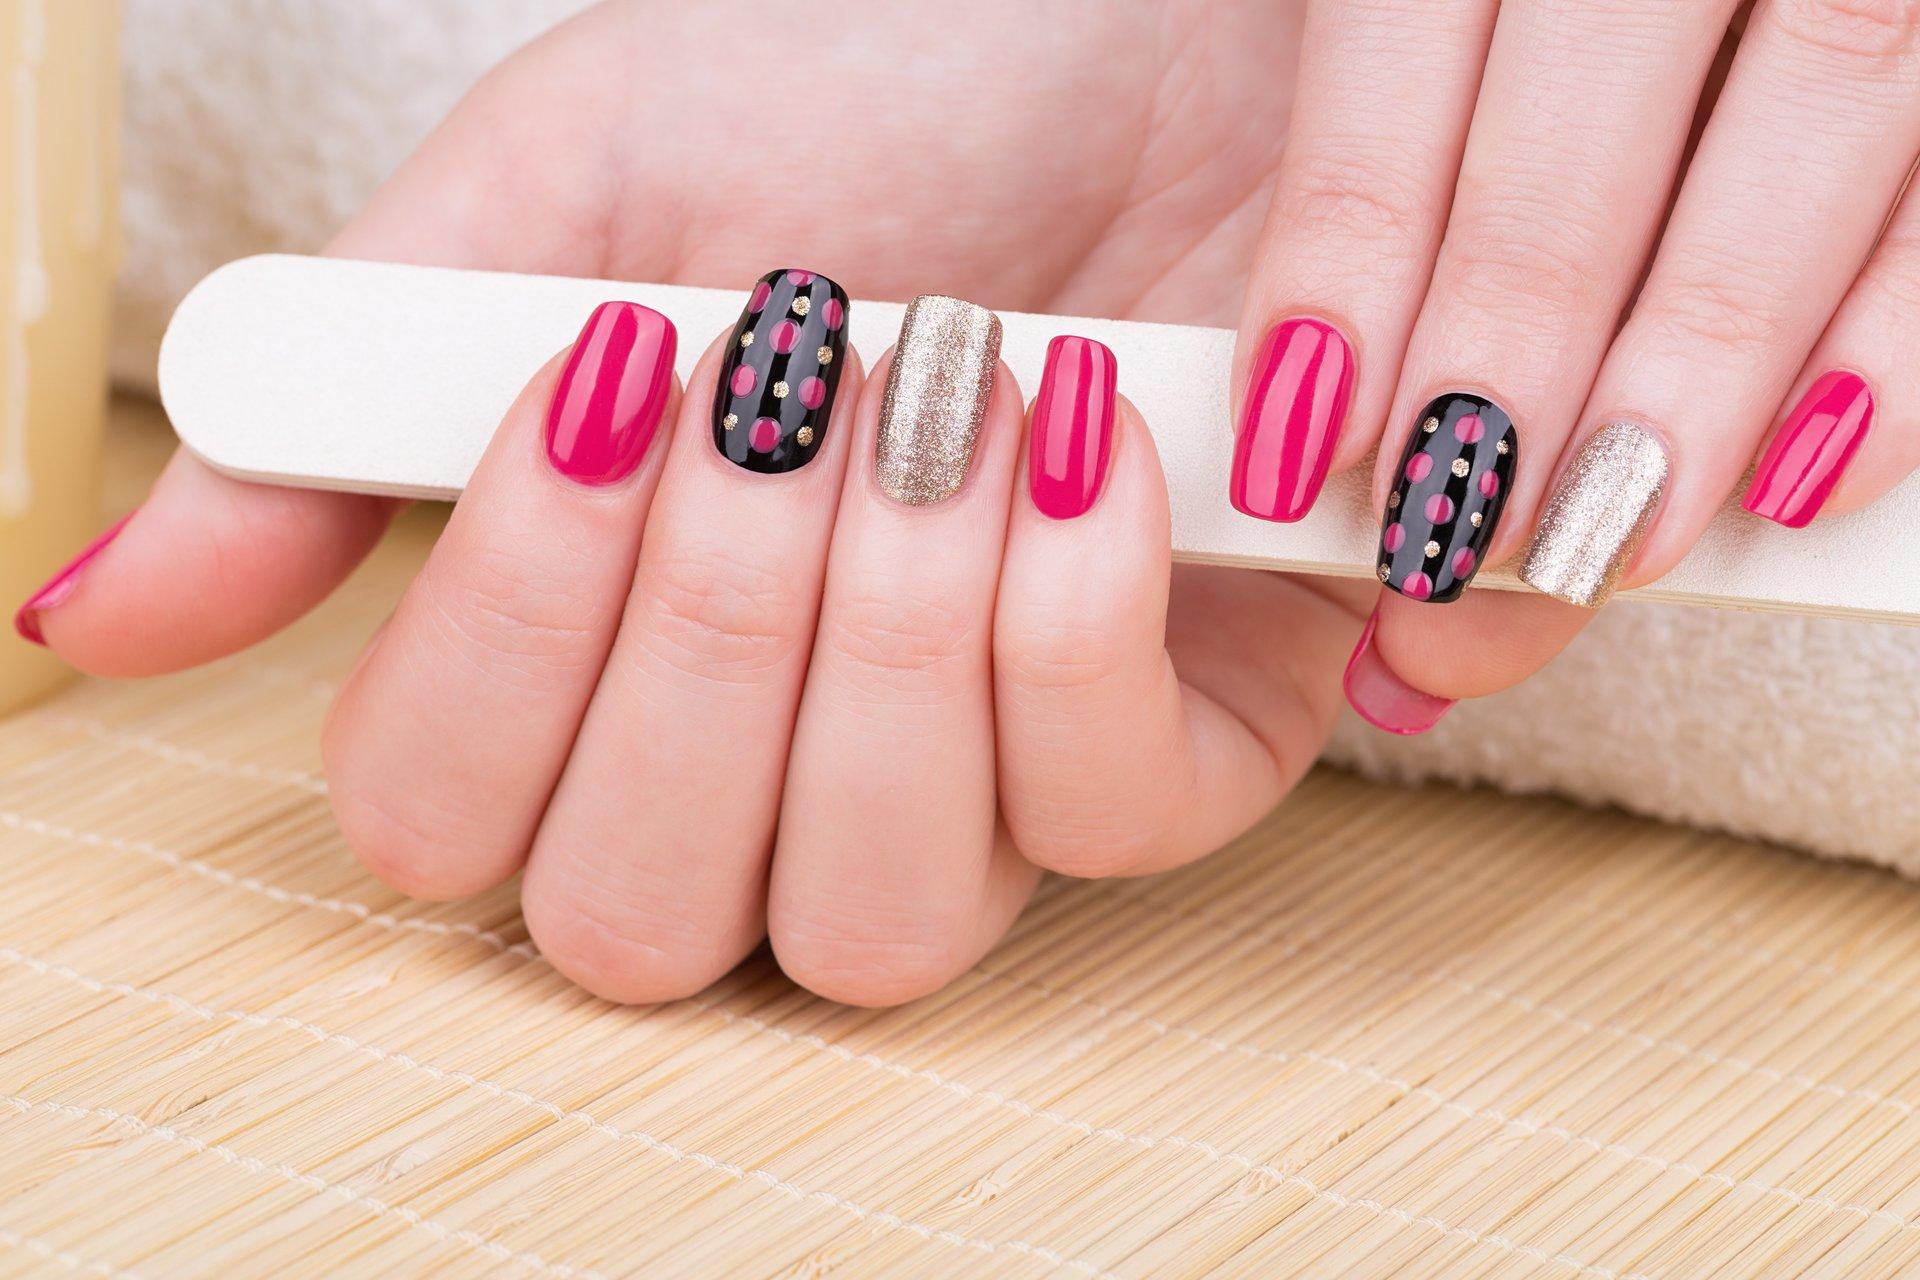 Beautiful nail art work